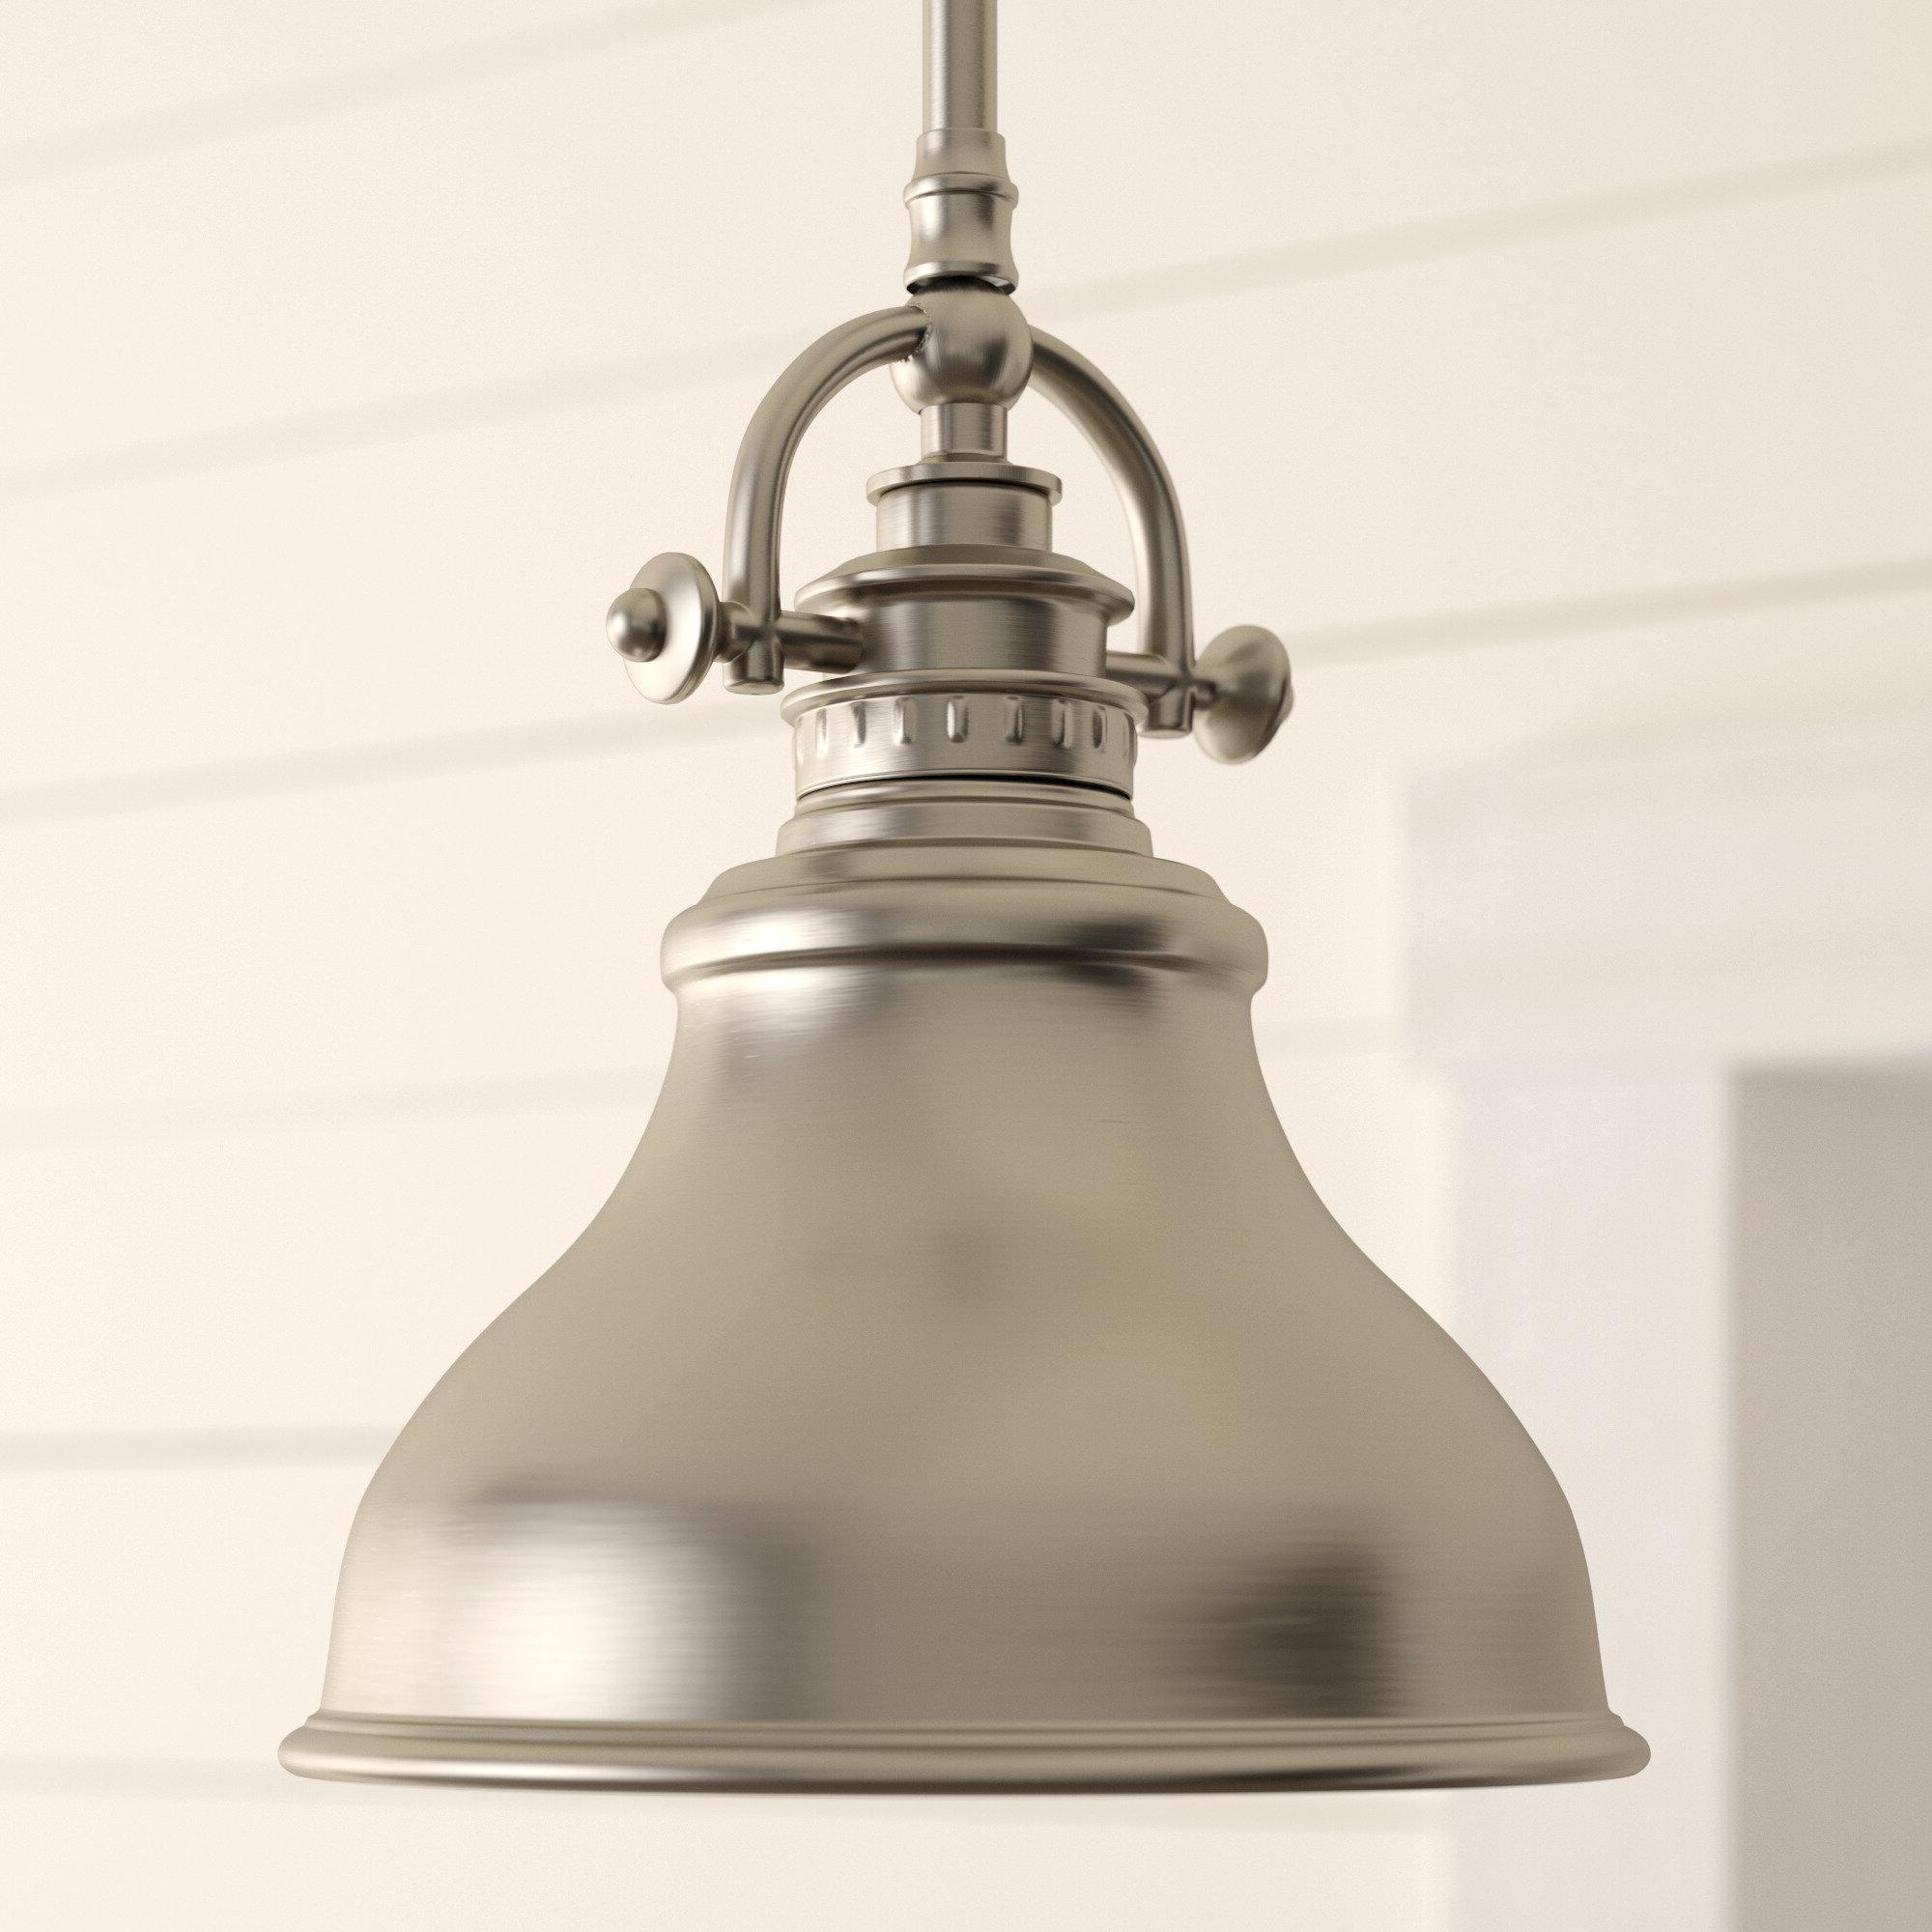 2019 Hamilton 1 Light Single Dome Pendants Throughout Beachcrest Home Mueller 1 Light Single Dome Pendant (View 2 of 20)